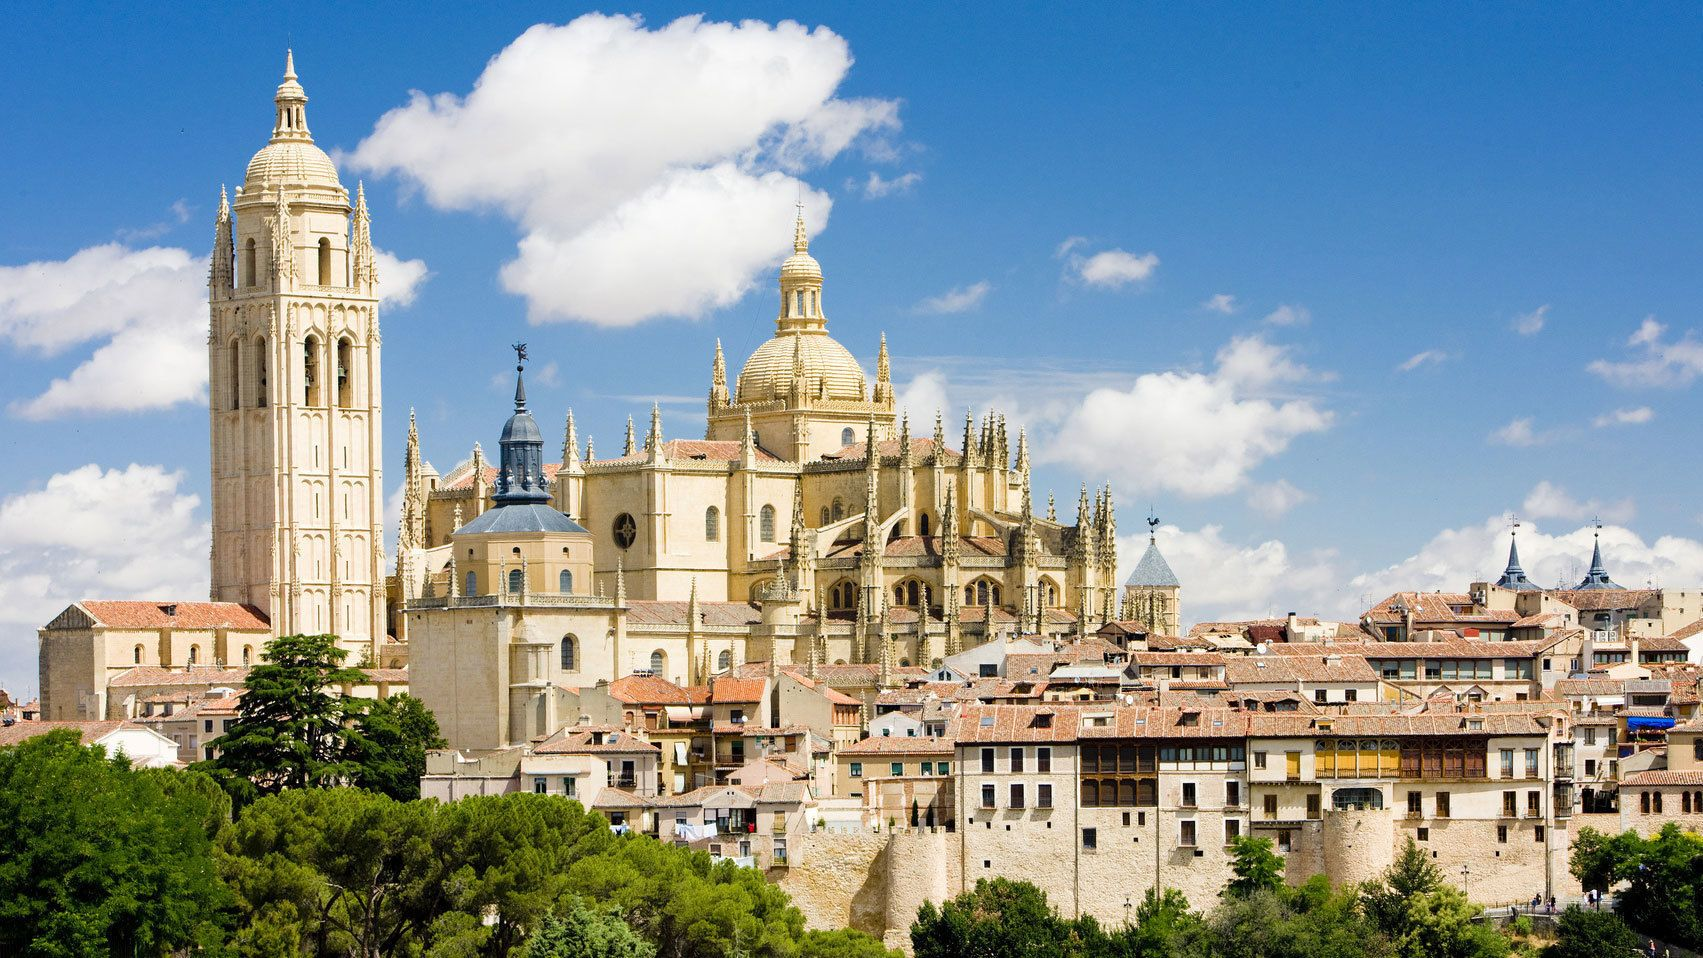 Avila With Walls & Segovia - Full Day Tour from Madrid